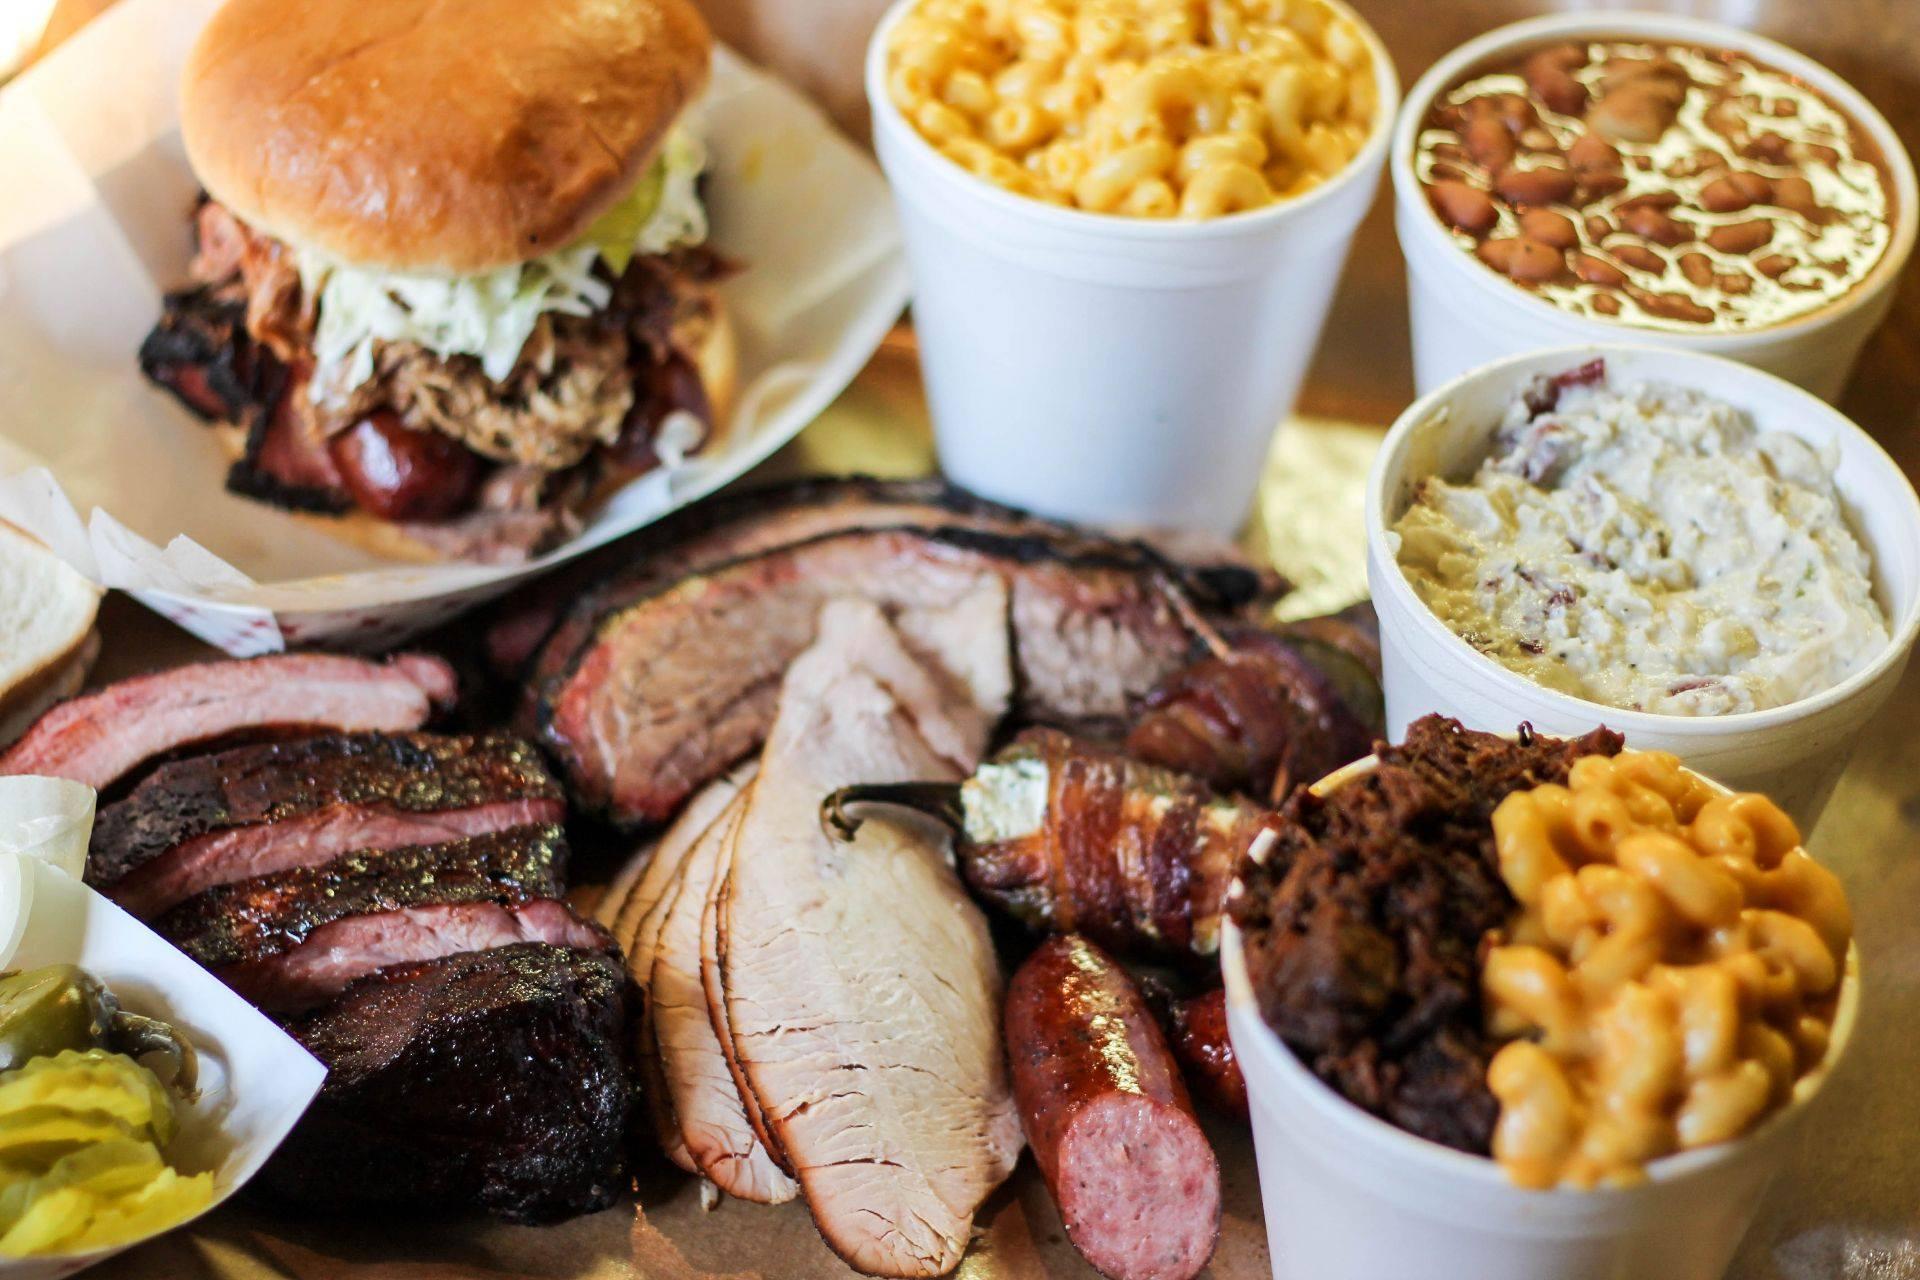 Barbecue from Alamo BBQ Co. in San Antonio